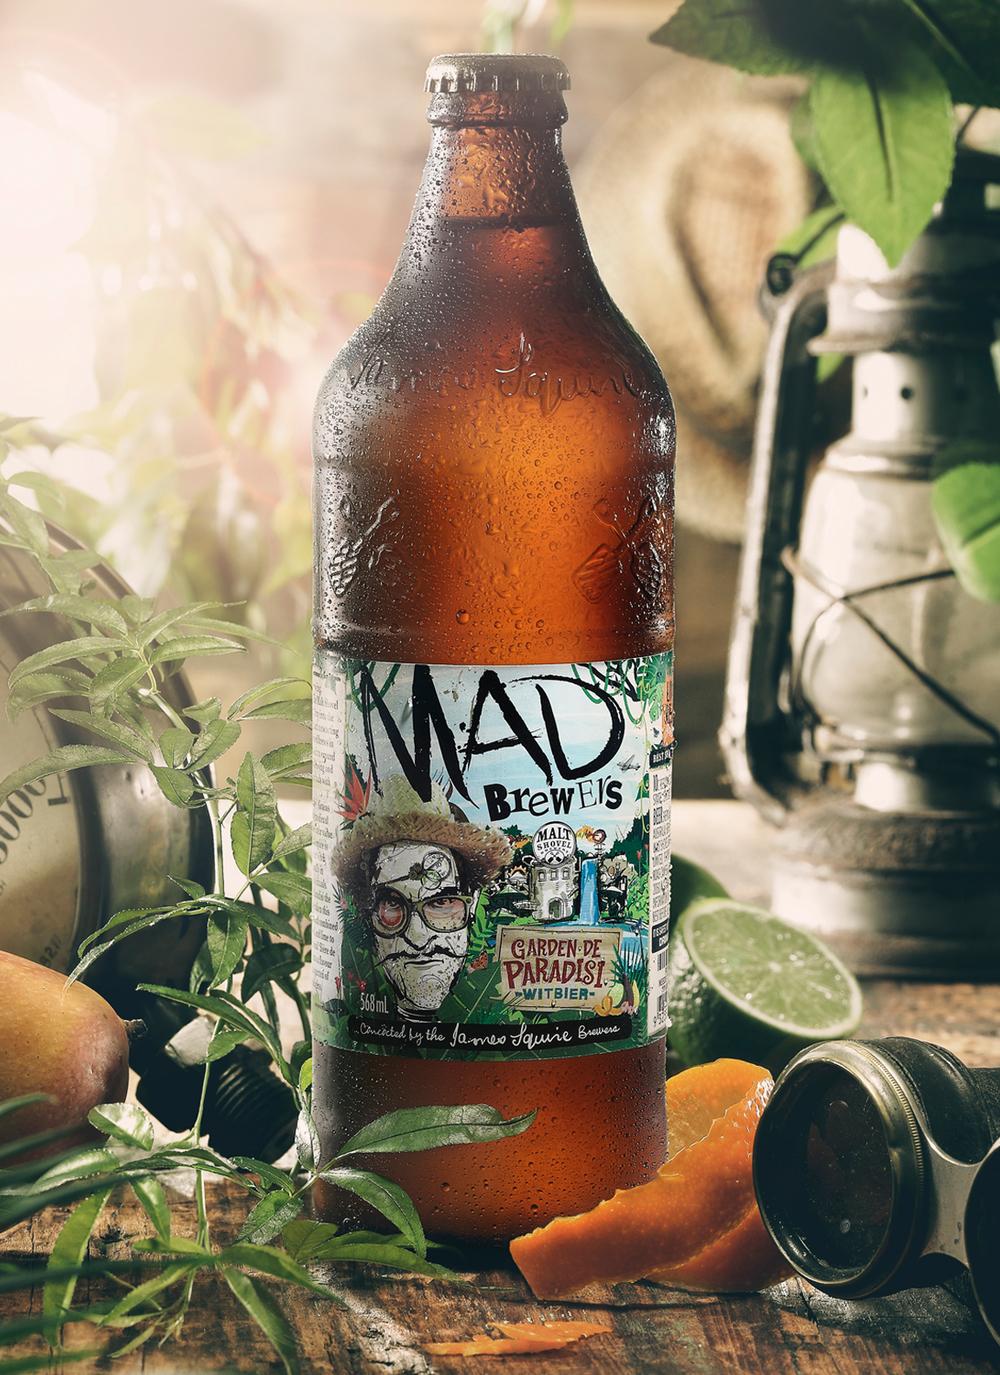 Mad_Brewers_Garden_De_Paradisi_Hero_LR.jpg